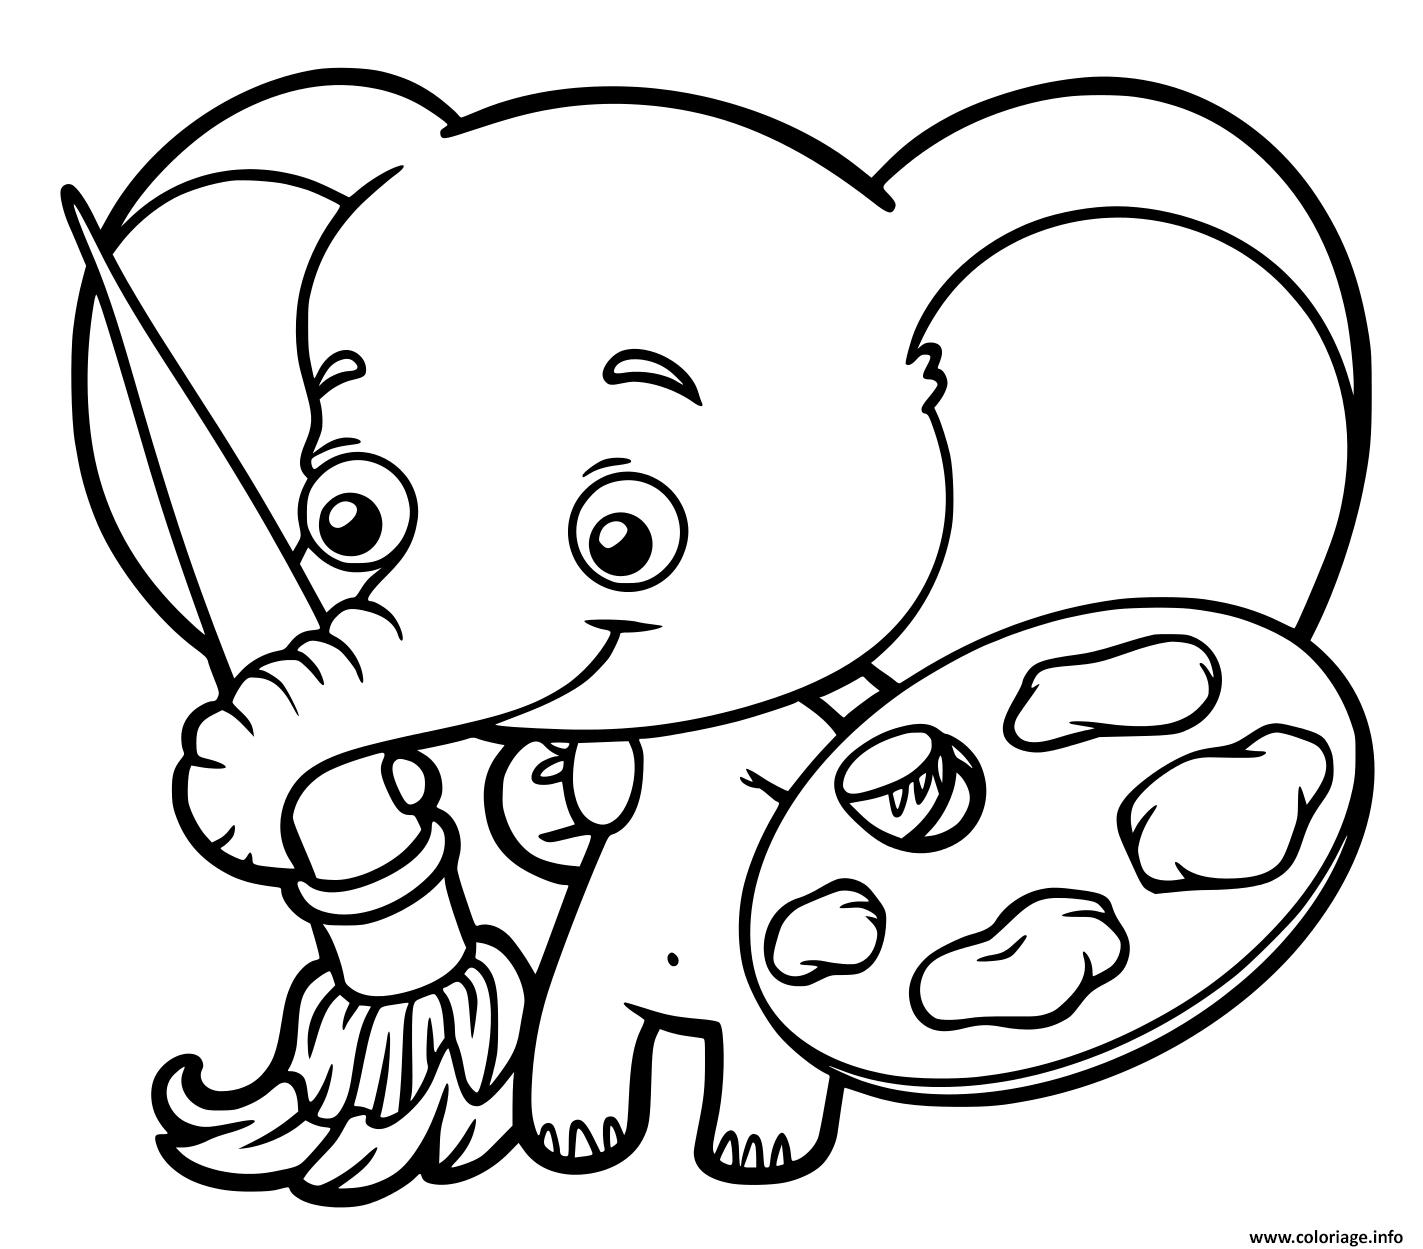 Coloriage Bebe Elephant Qui Peinture Dessin Elephant A Imprimer